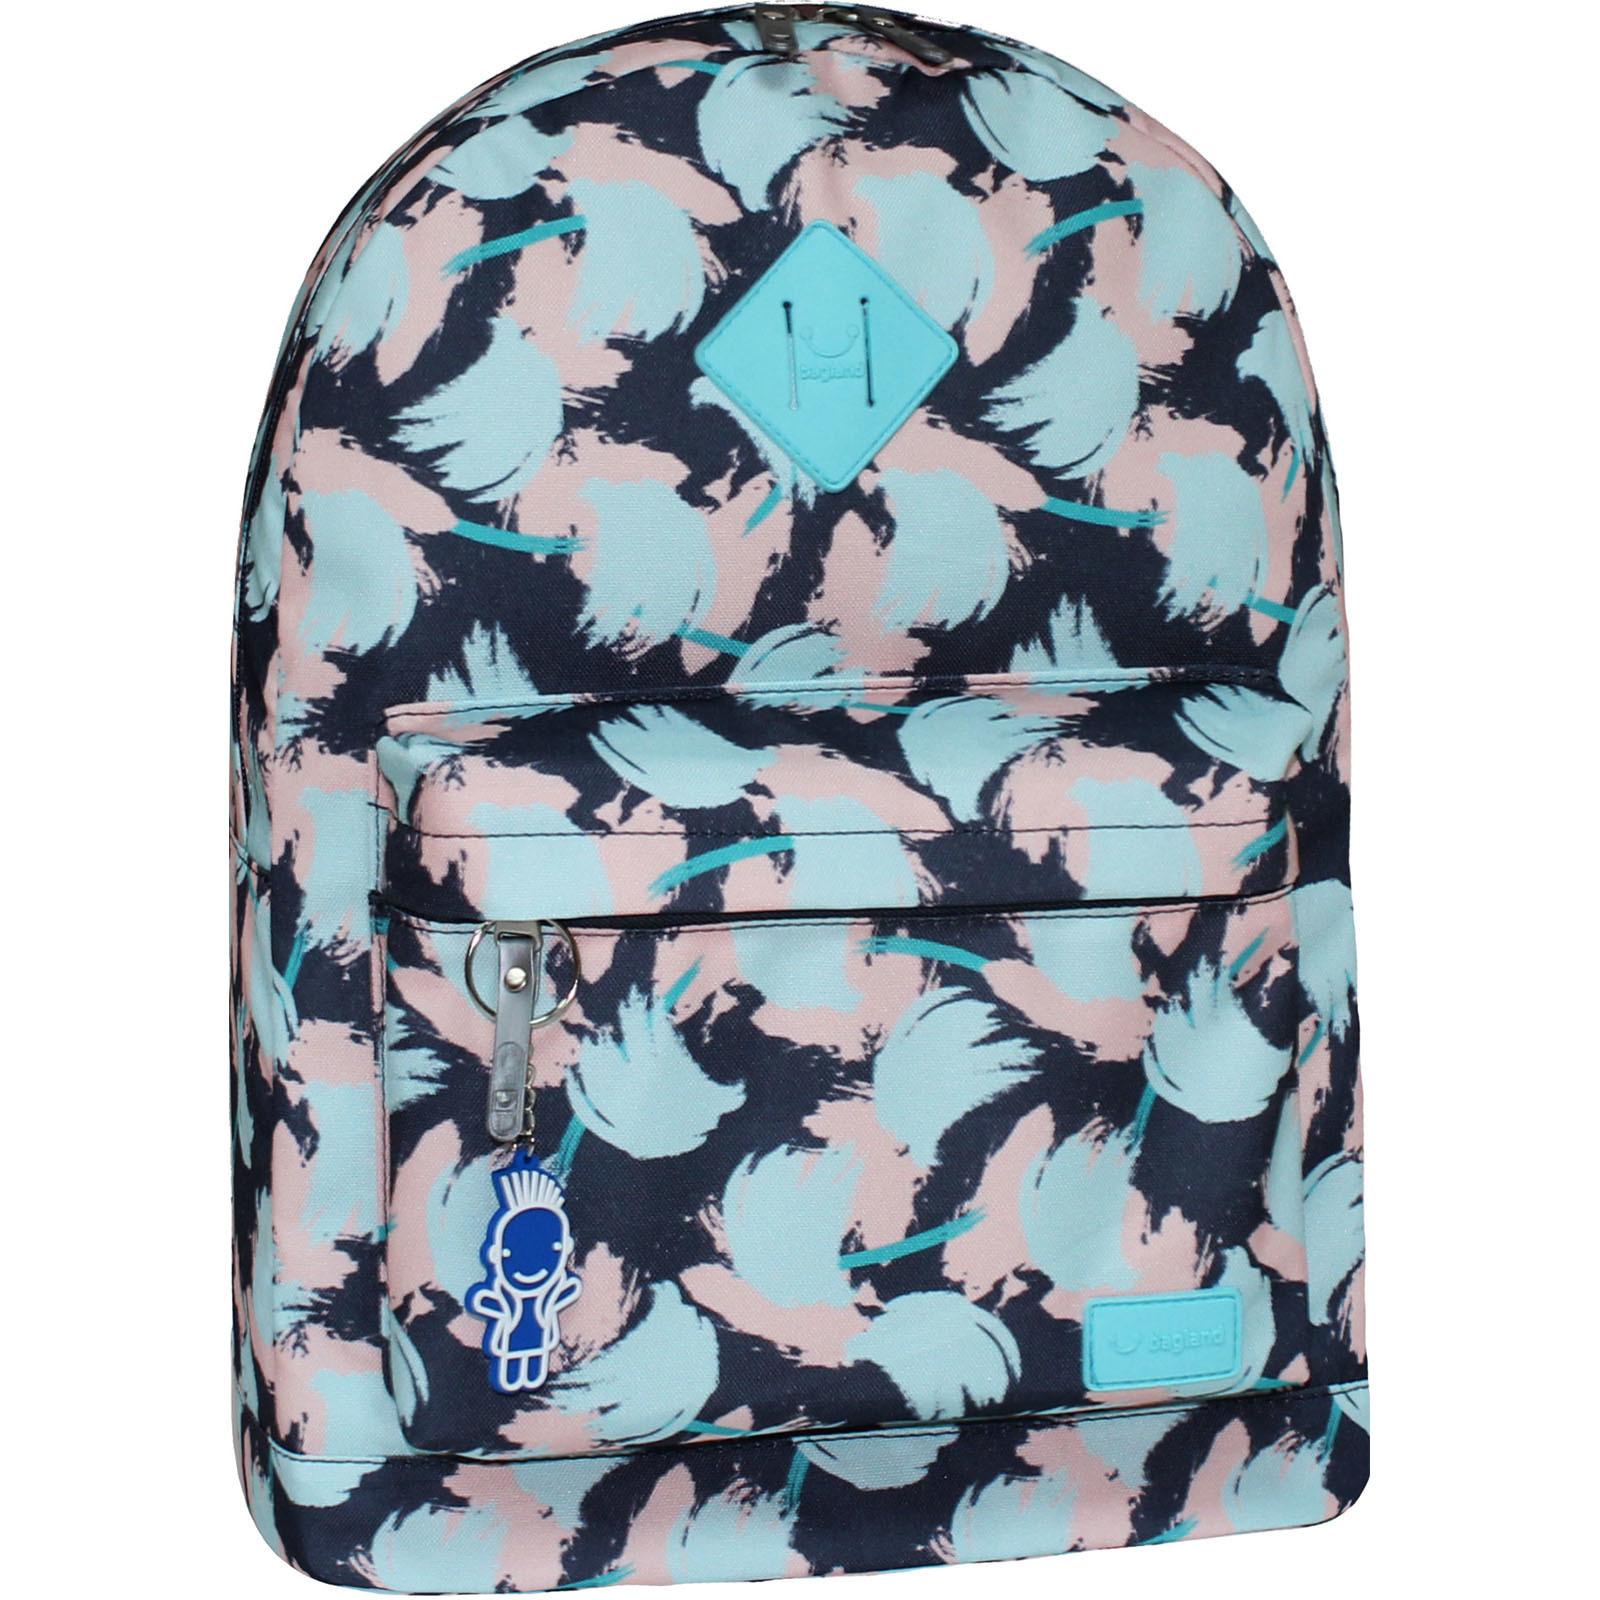 Городские рюкзаки Рюкзак Bagland Молодежный (дизайн) 17 л. сублимация 244 (00533664) IMG_7049.JPG